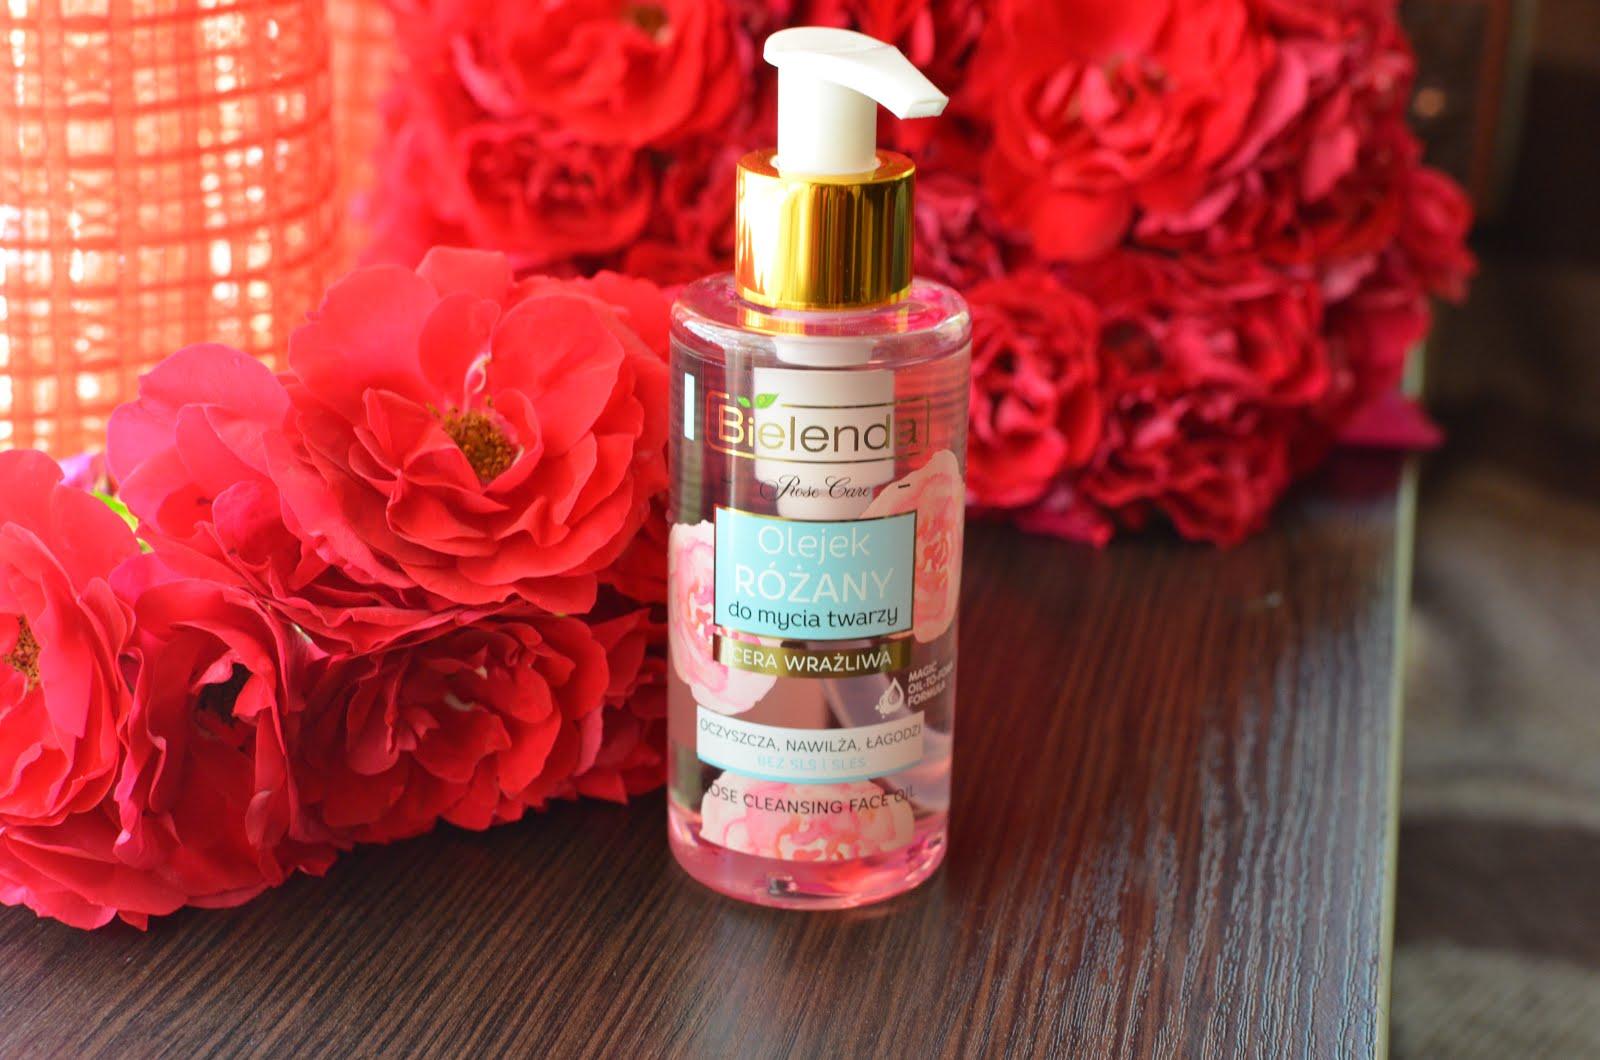 Bielenda Rose Care Cleansing Face Oil For Sensitive Skin Розовое масло для умывания